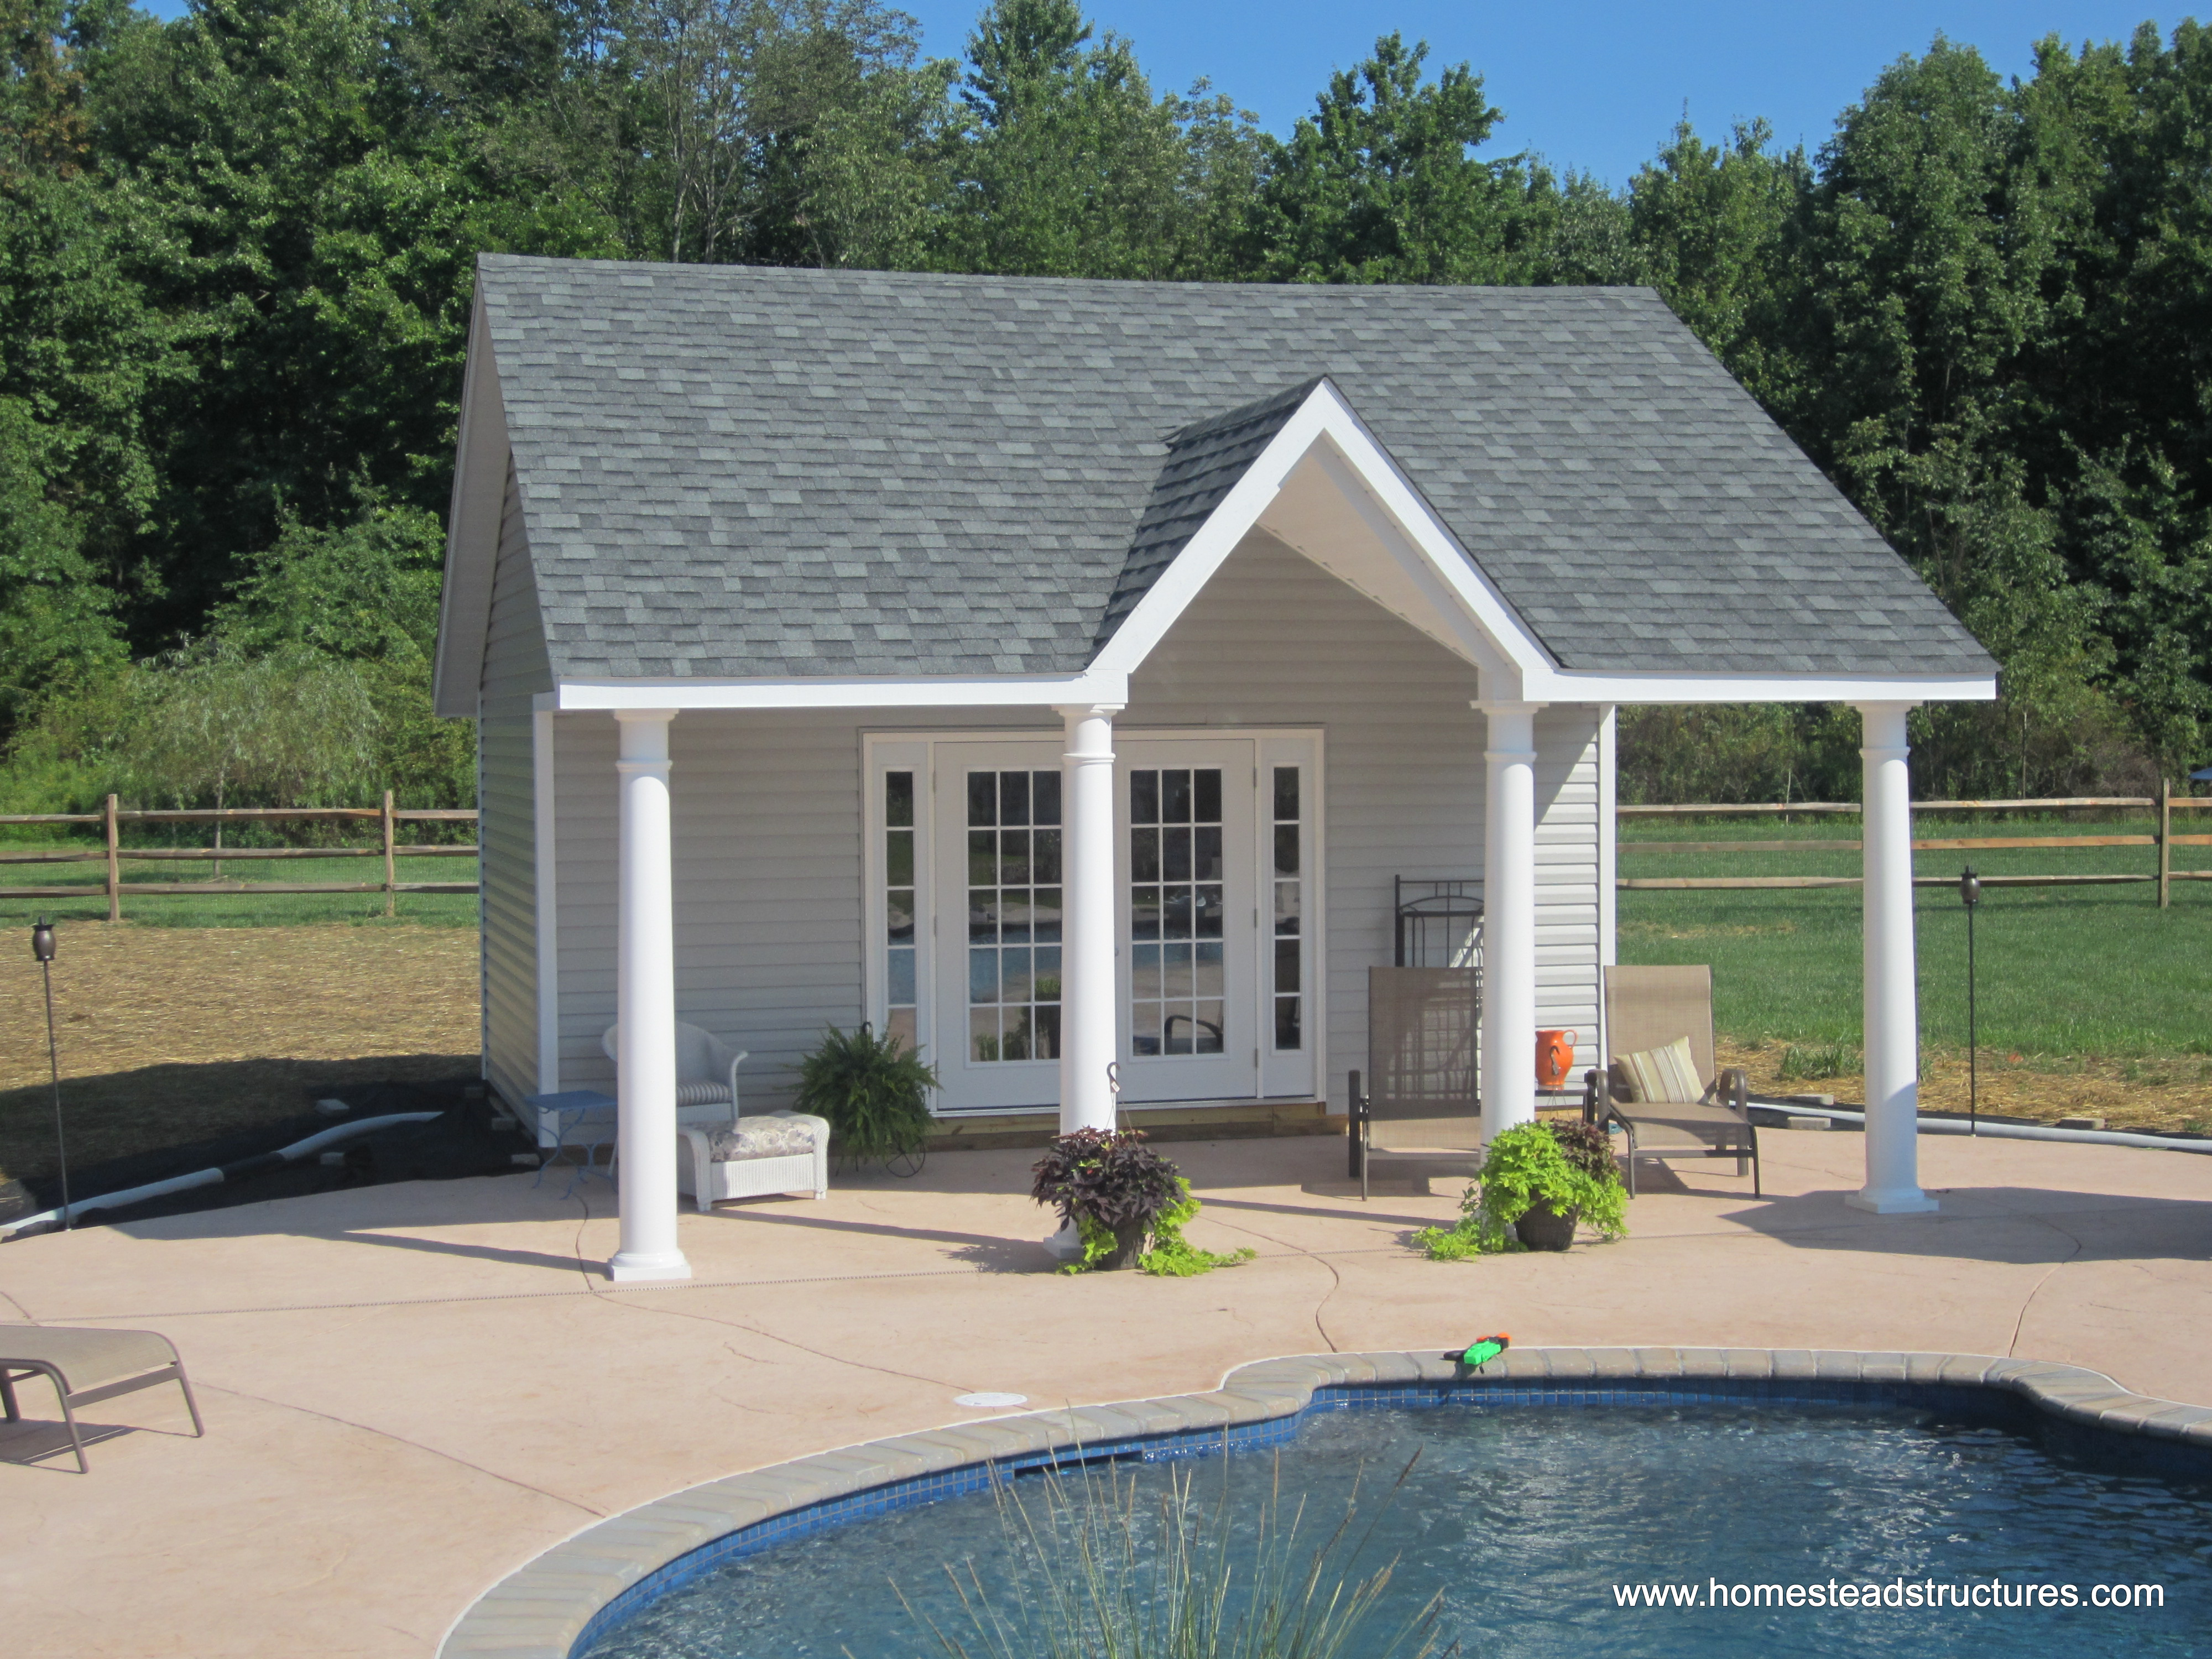 Custom pool house plans ideas pool cabanas in new for Custom pool house